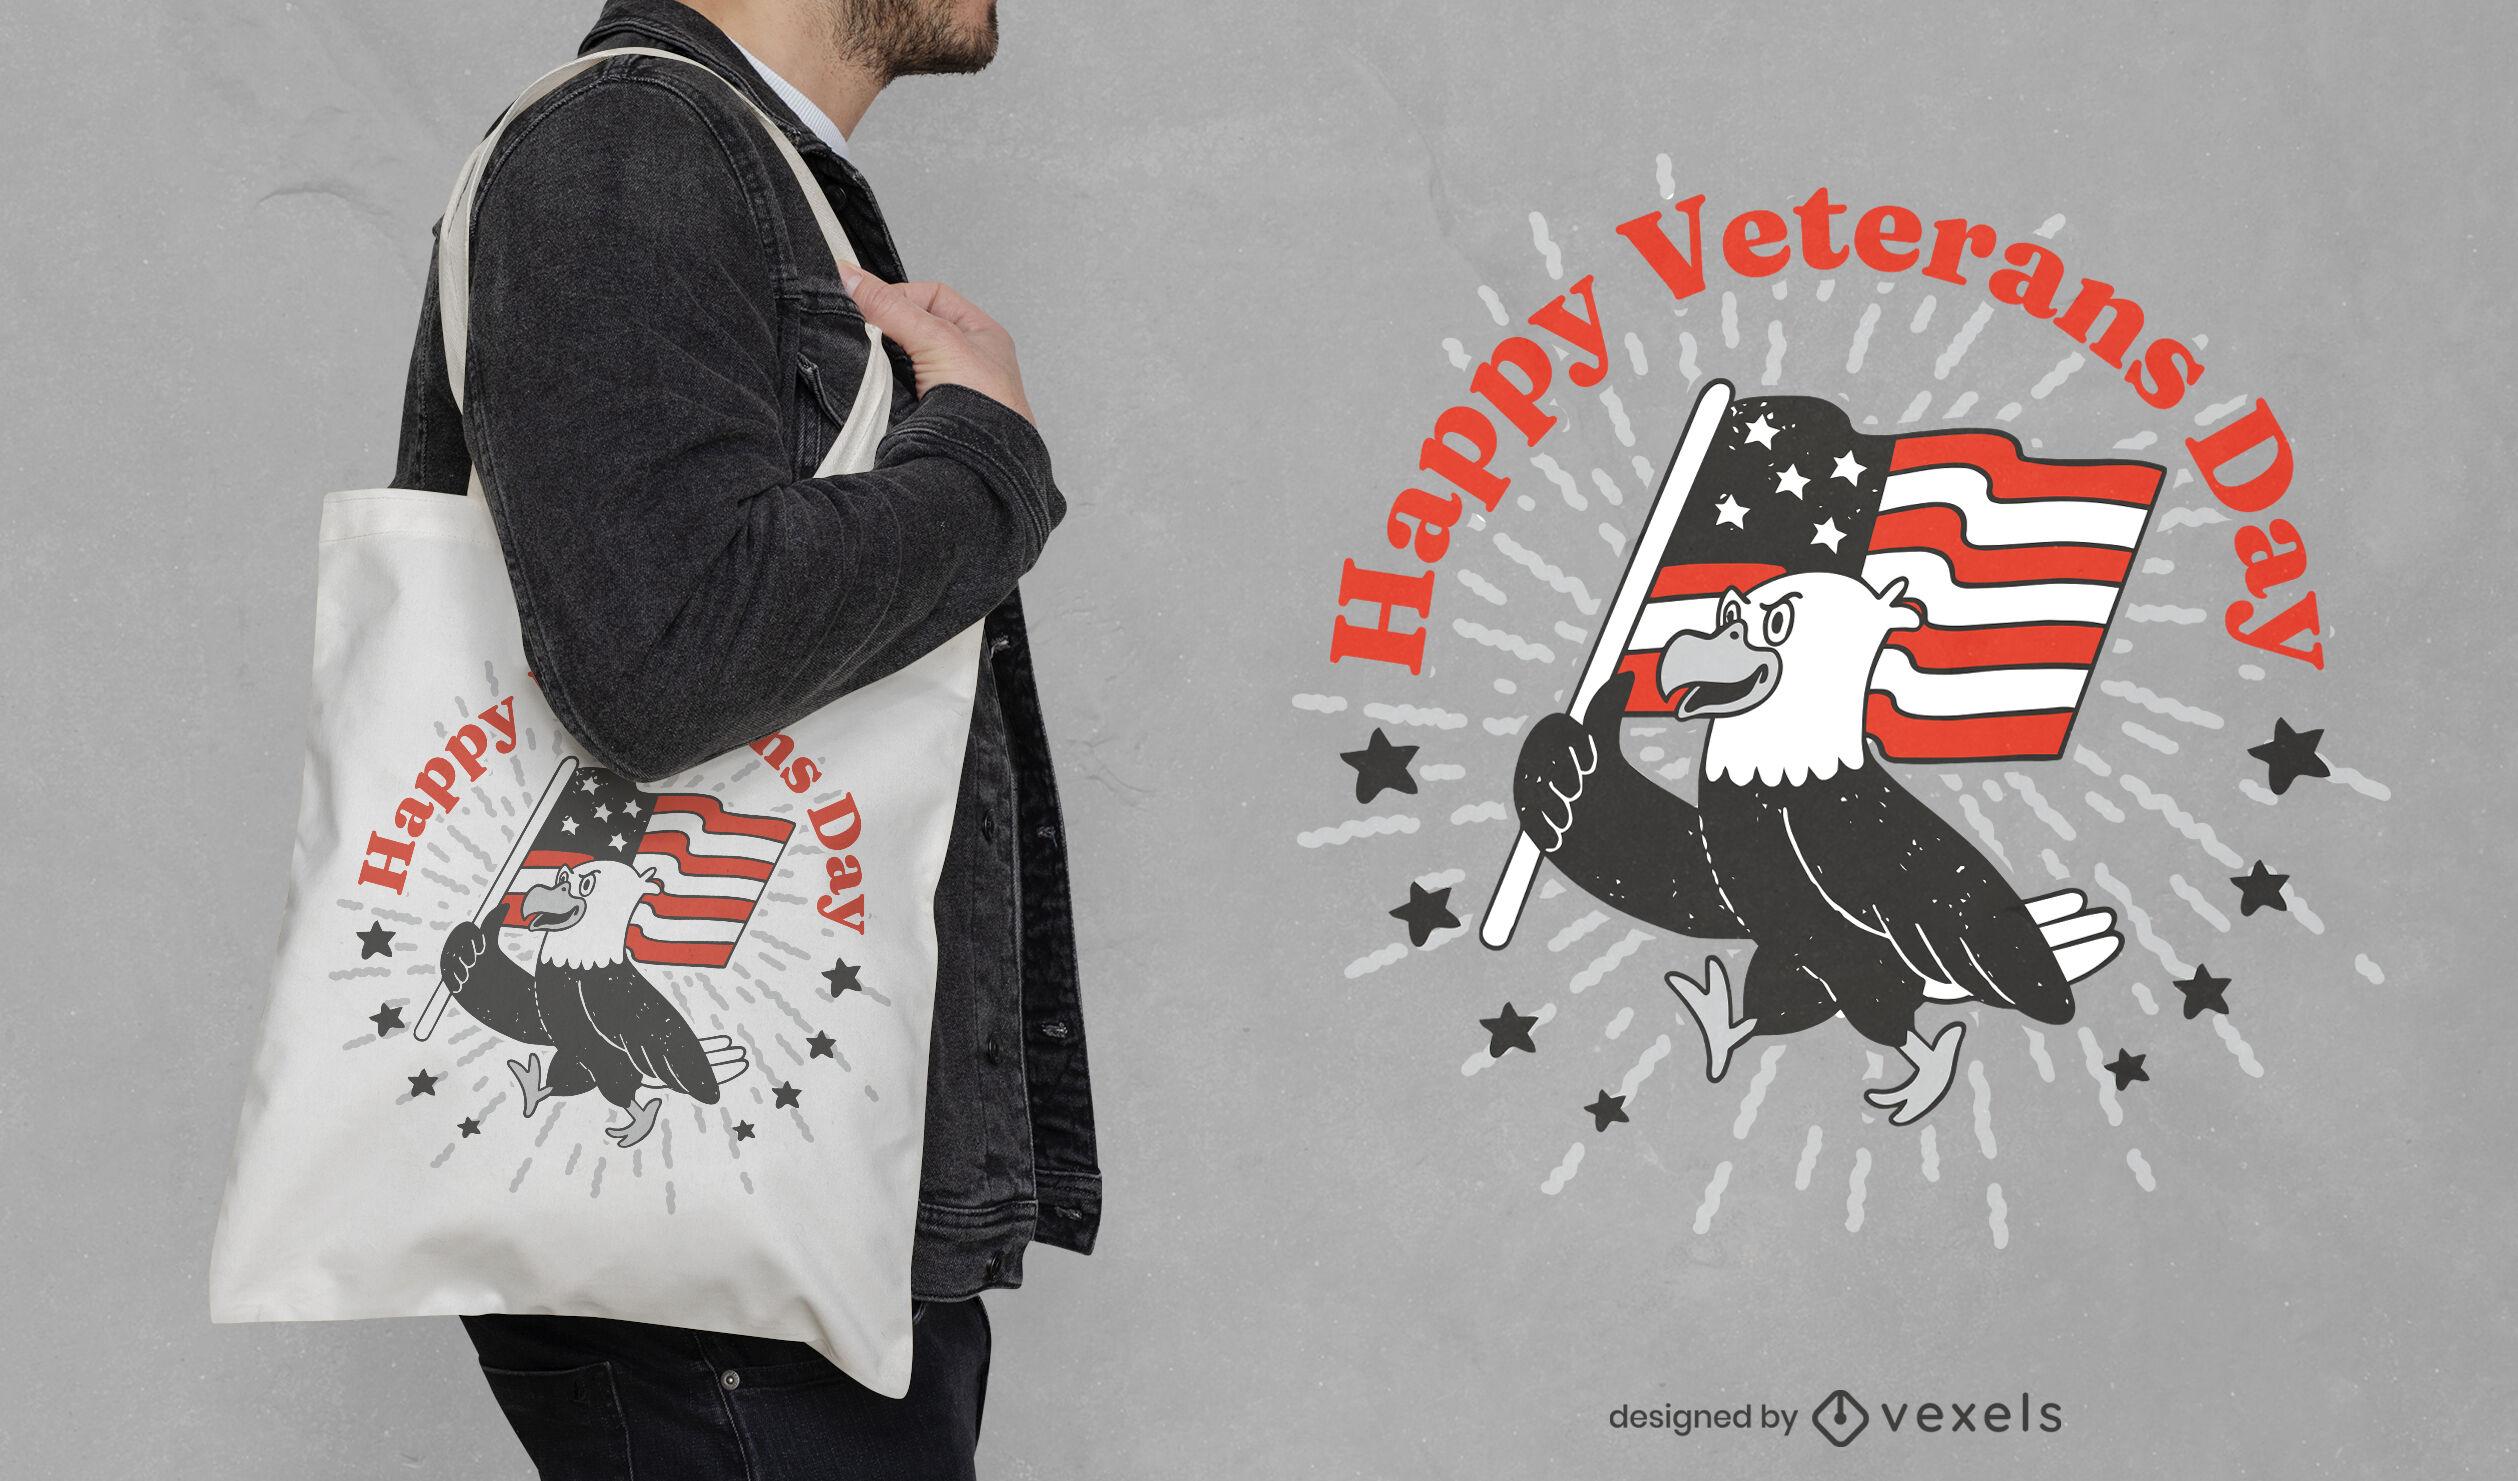 Adler mit Flagge Veterans Day Tote Bag Design